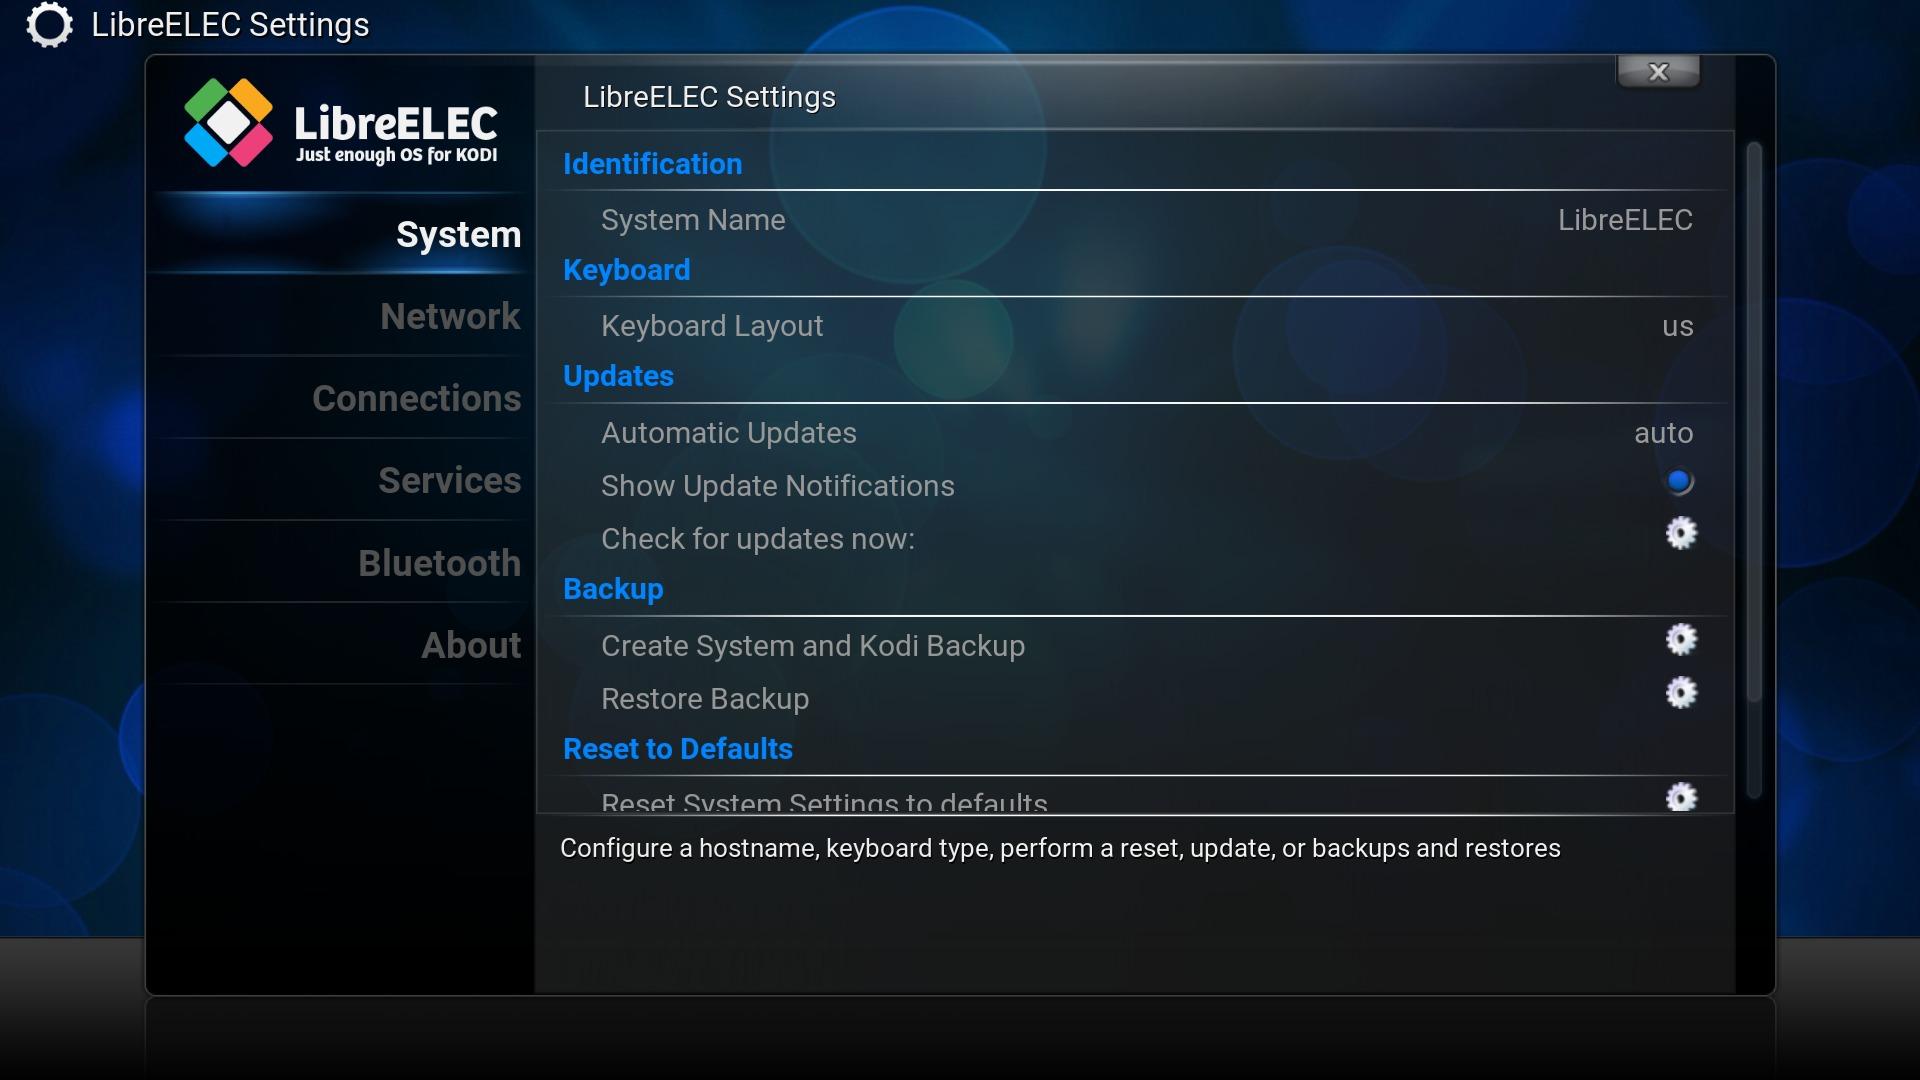 Configuring LibreELEC